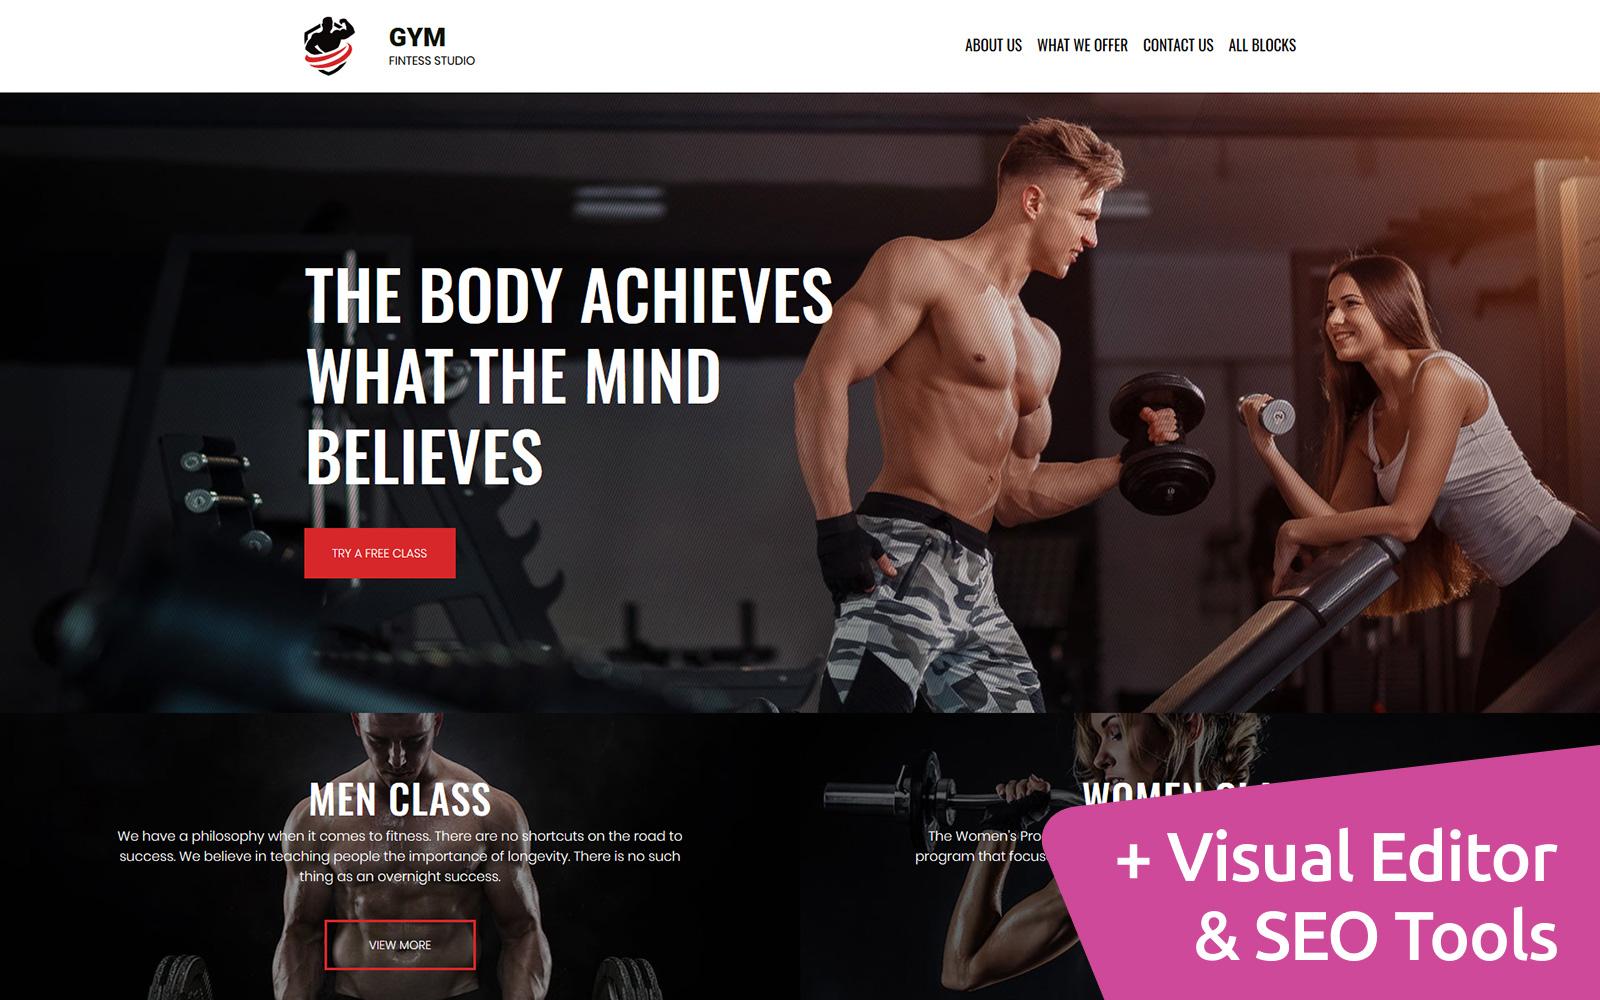 Gym - Fitness Studio Templates de Landing Page №81566